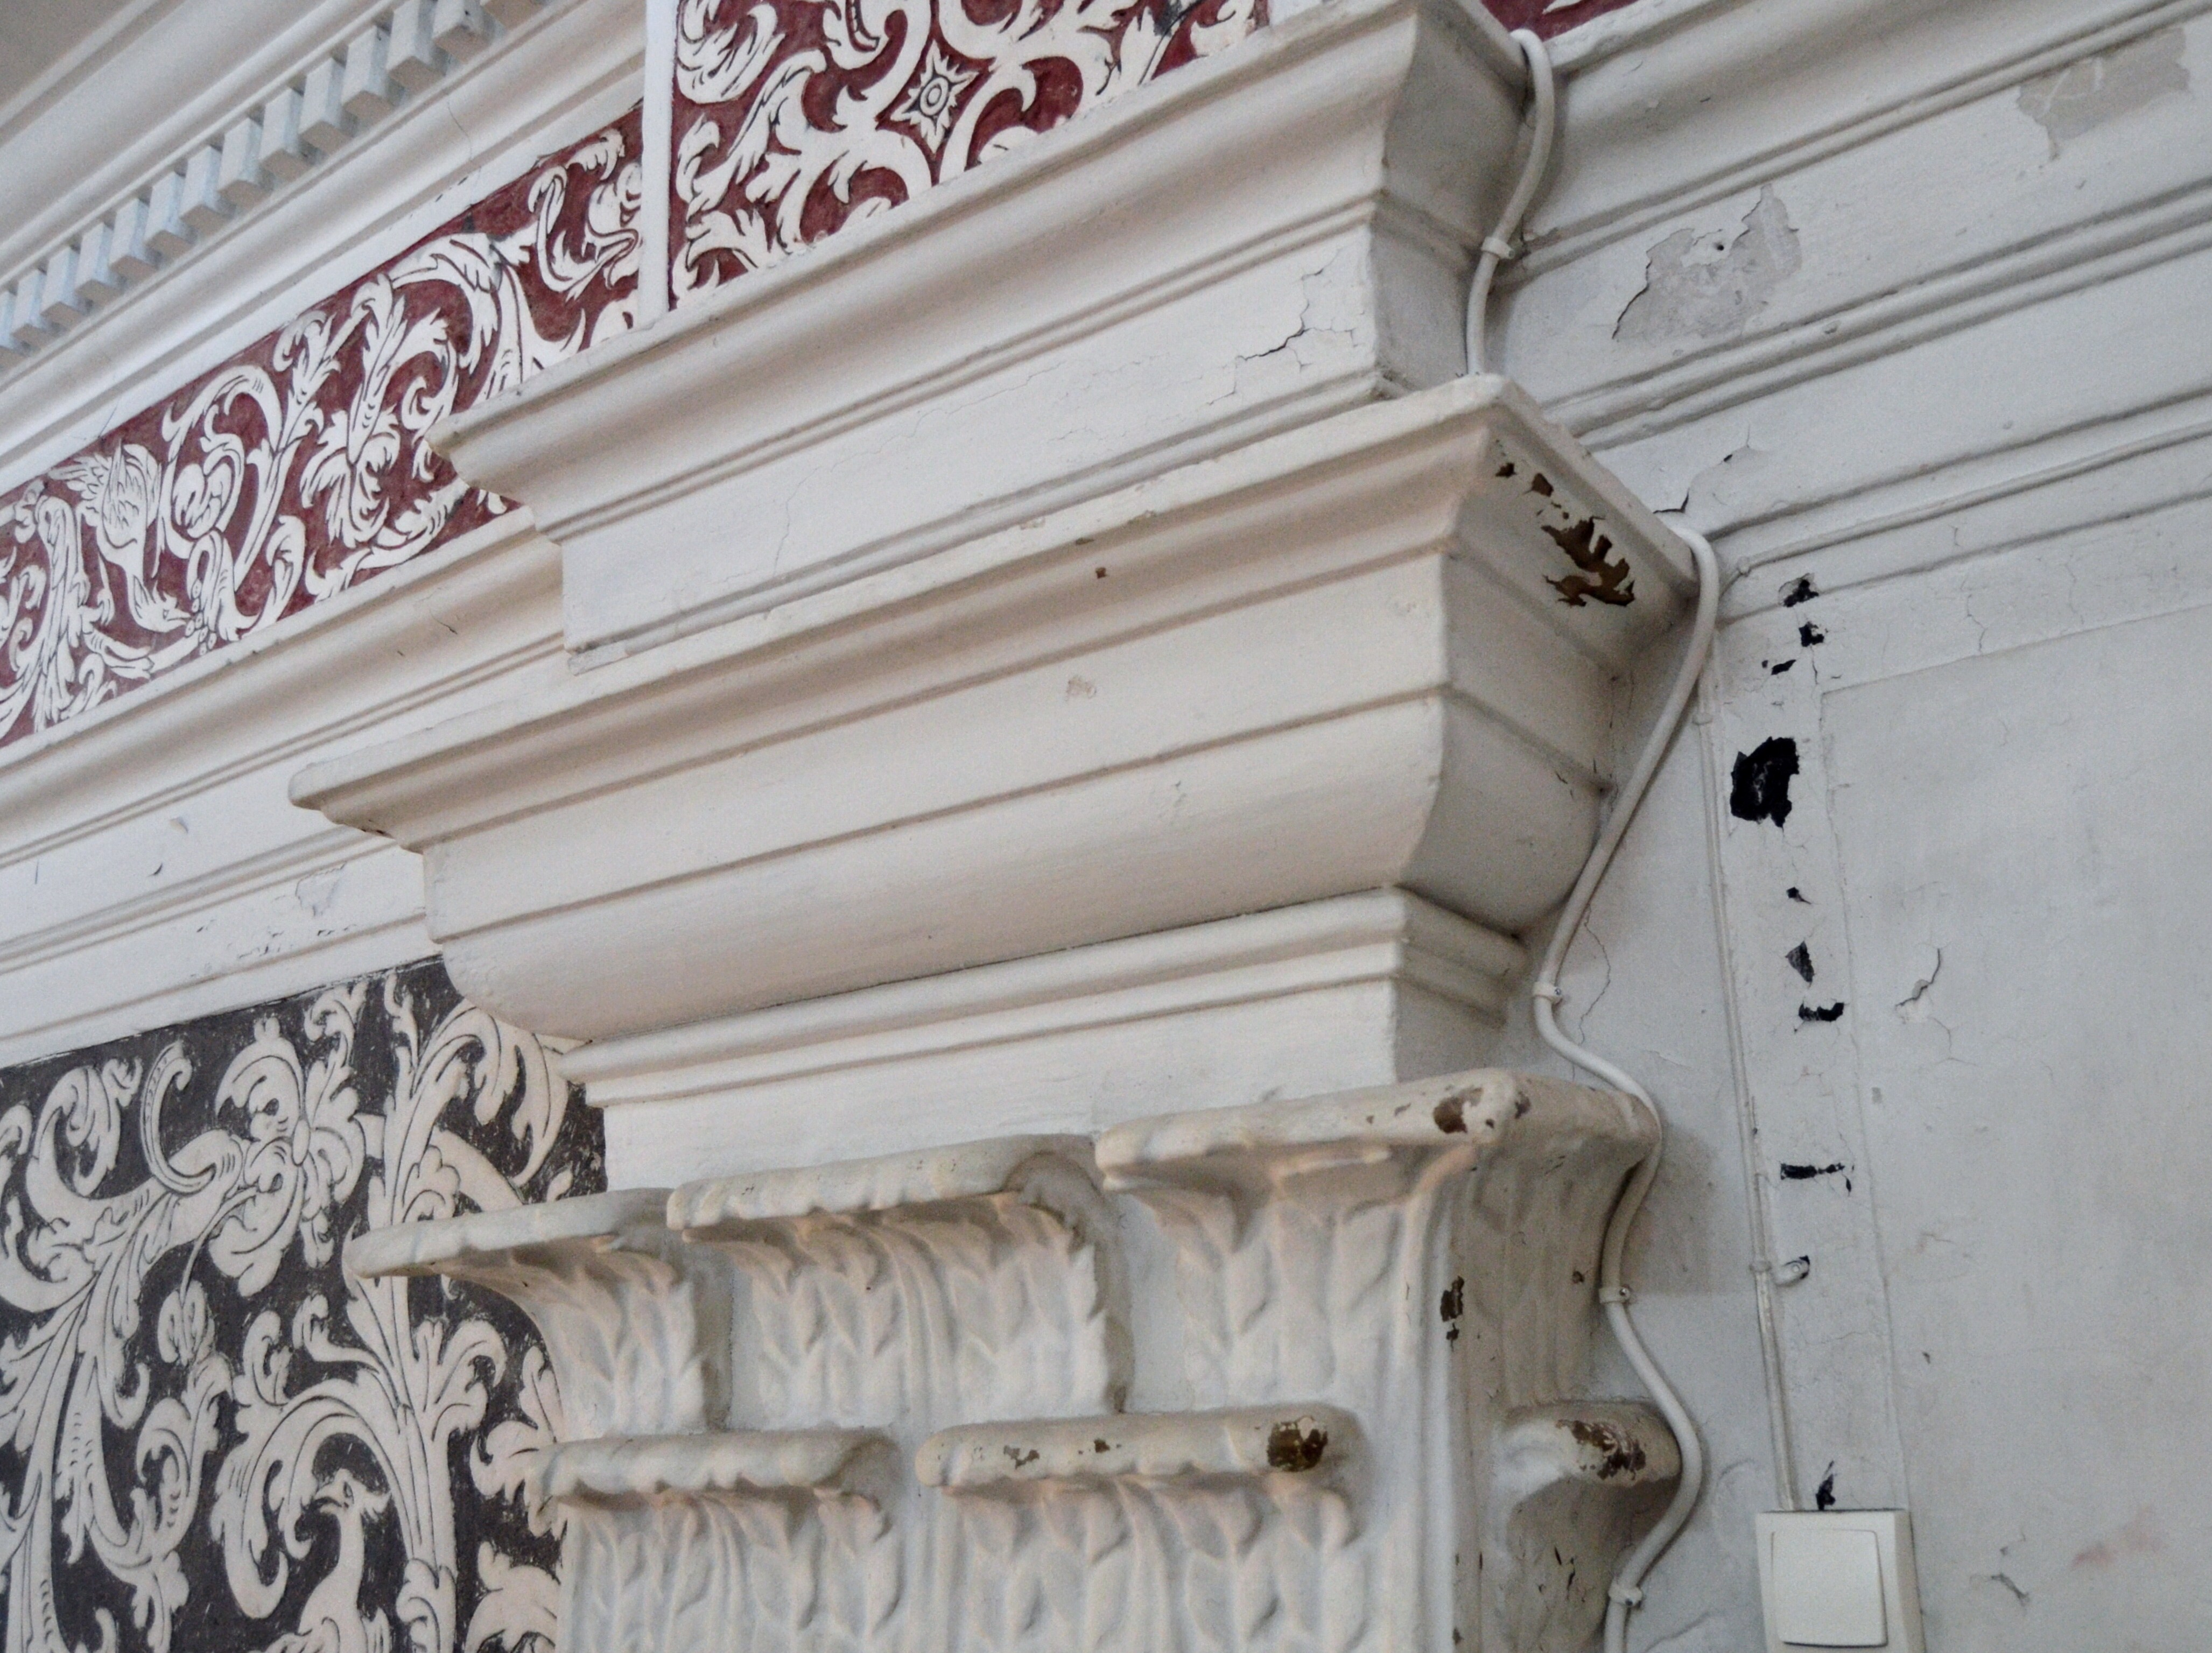 File:Capitell, església de la Mare de Déu dels Àngels de Benavites.JPG - Wiki...